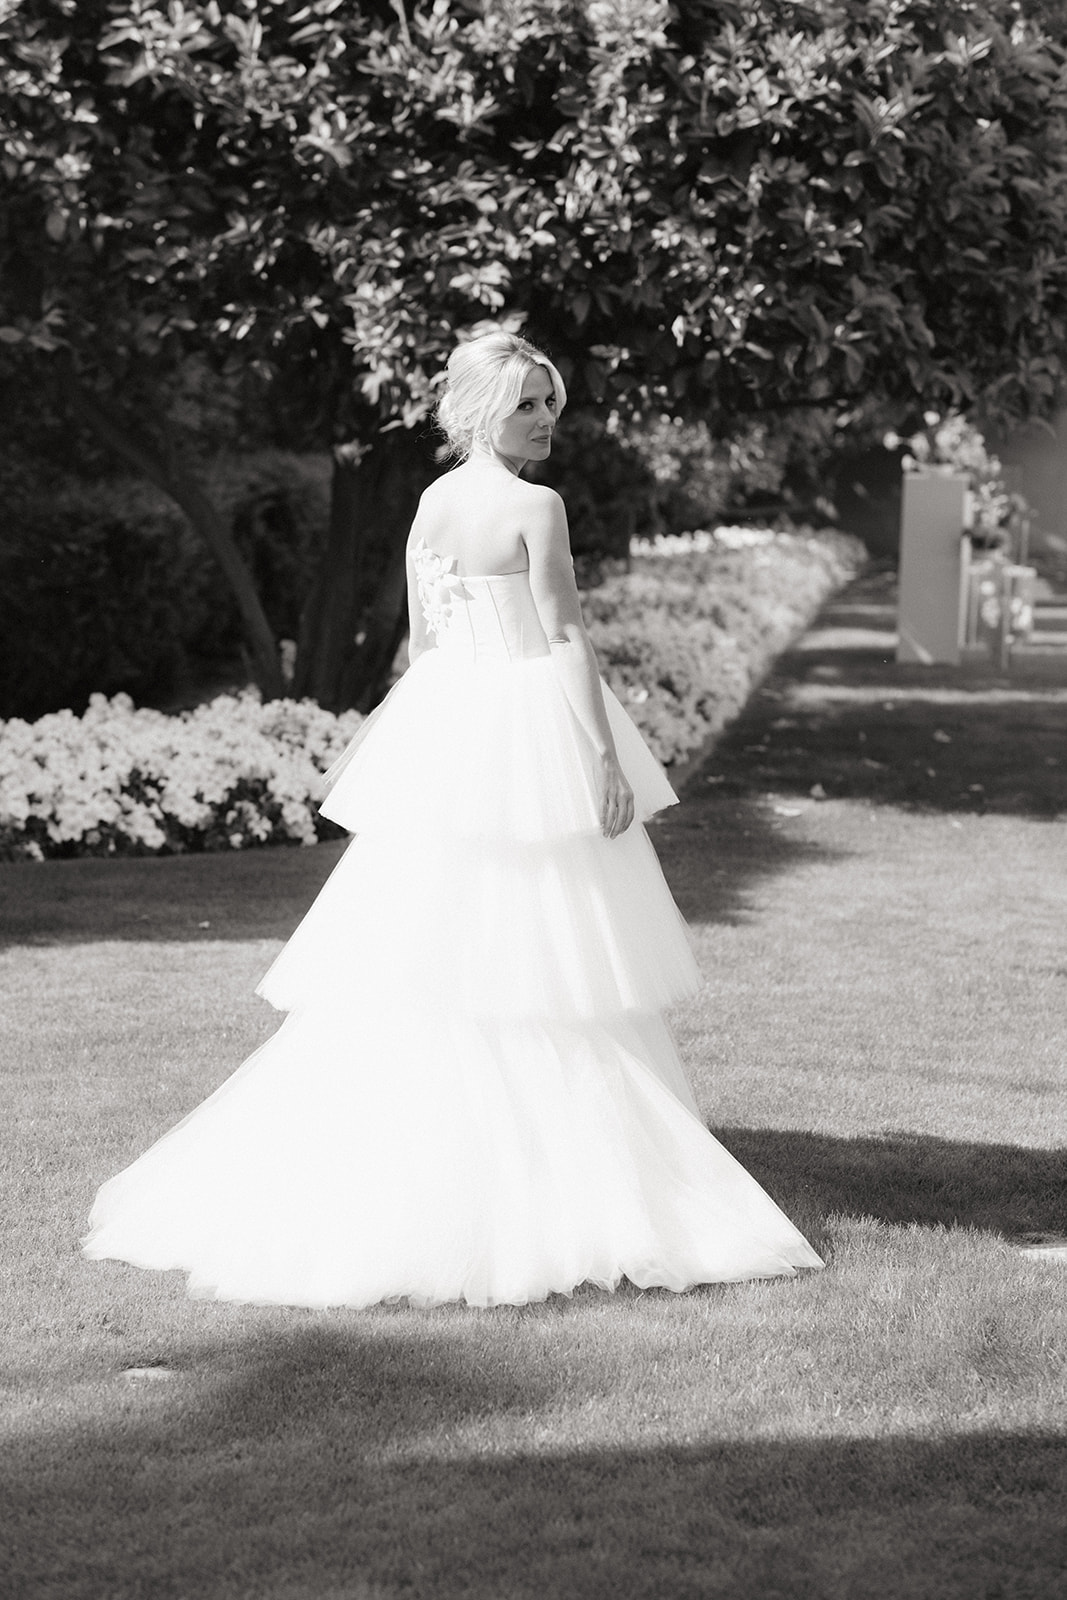 KL_WEDDING_0129.jpg